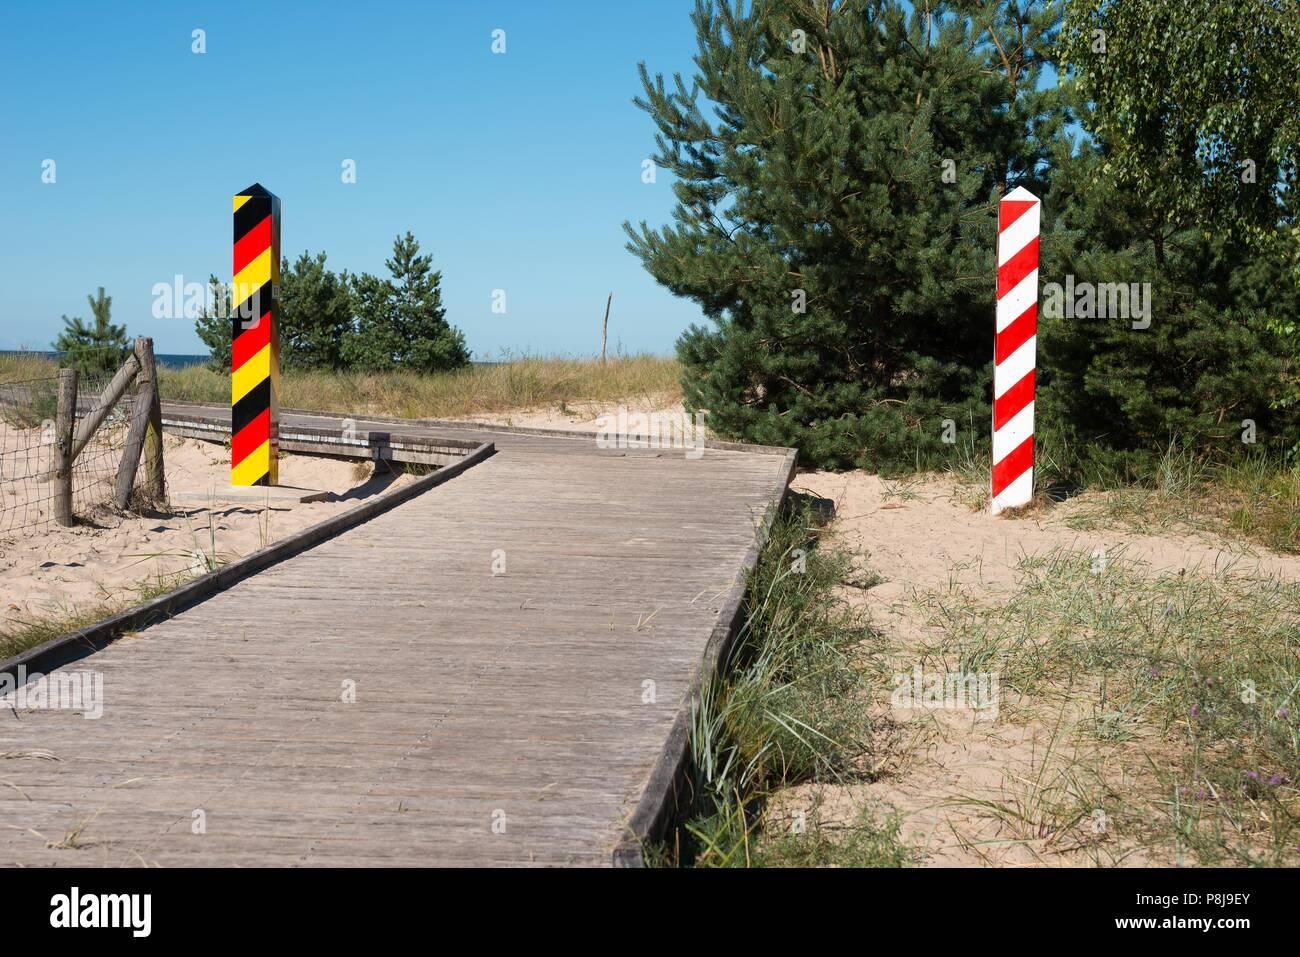 Boardwalk on the former death strip, border between Germany and Poland, Baltic Sea coast, Ahlbeck, Swinemünde, island Usedom Stock Photo